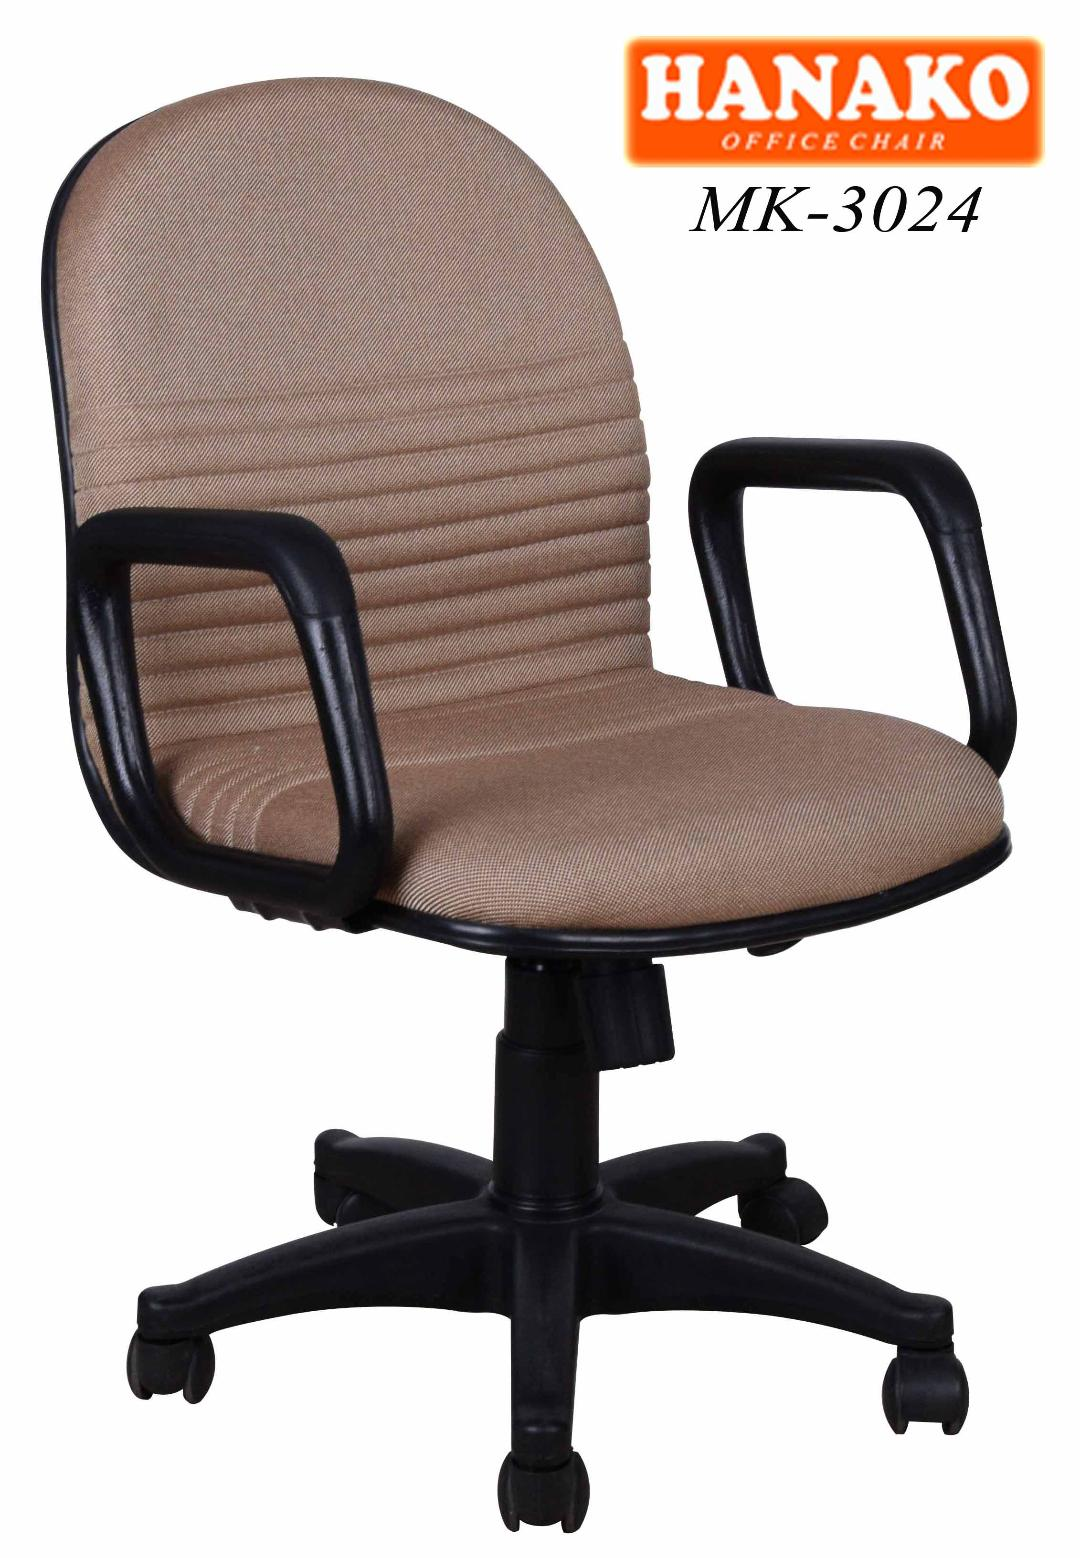 MK 3024 - Kursi kantor Hanako MK-3024